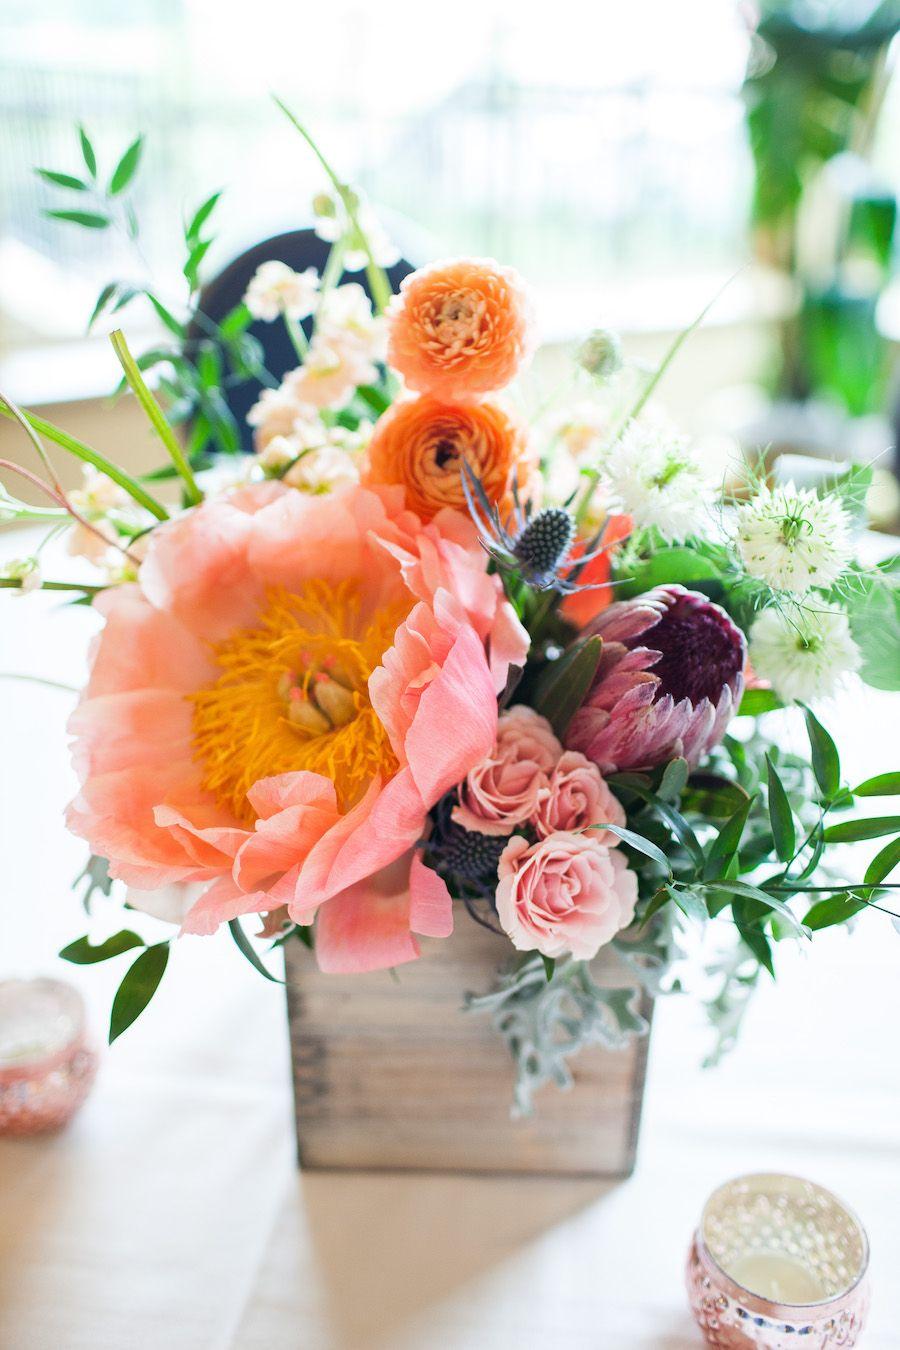 Wedding Spotlight | Lauren + Ray | Interview with the bride | Pewter and navy palette, romantic, boho wedding | #RealWedding #cincinnati #cincywedding #kenwoodcountryclub #customstationery #stationery #navy #pewter #gray Photos @nathan0227